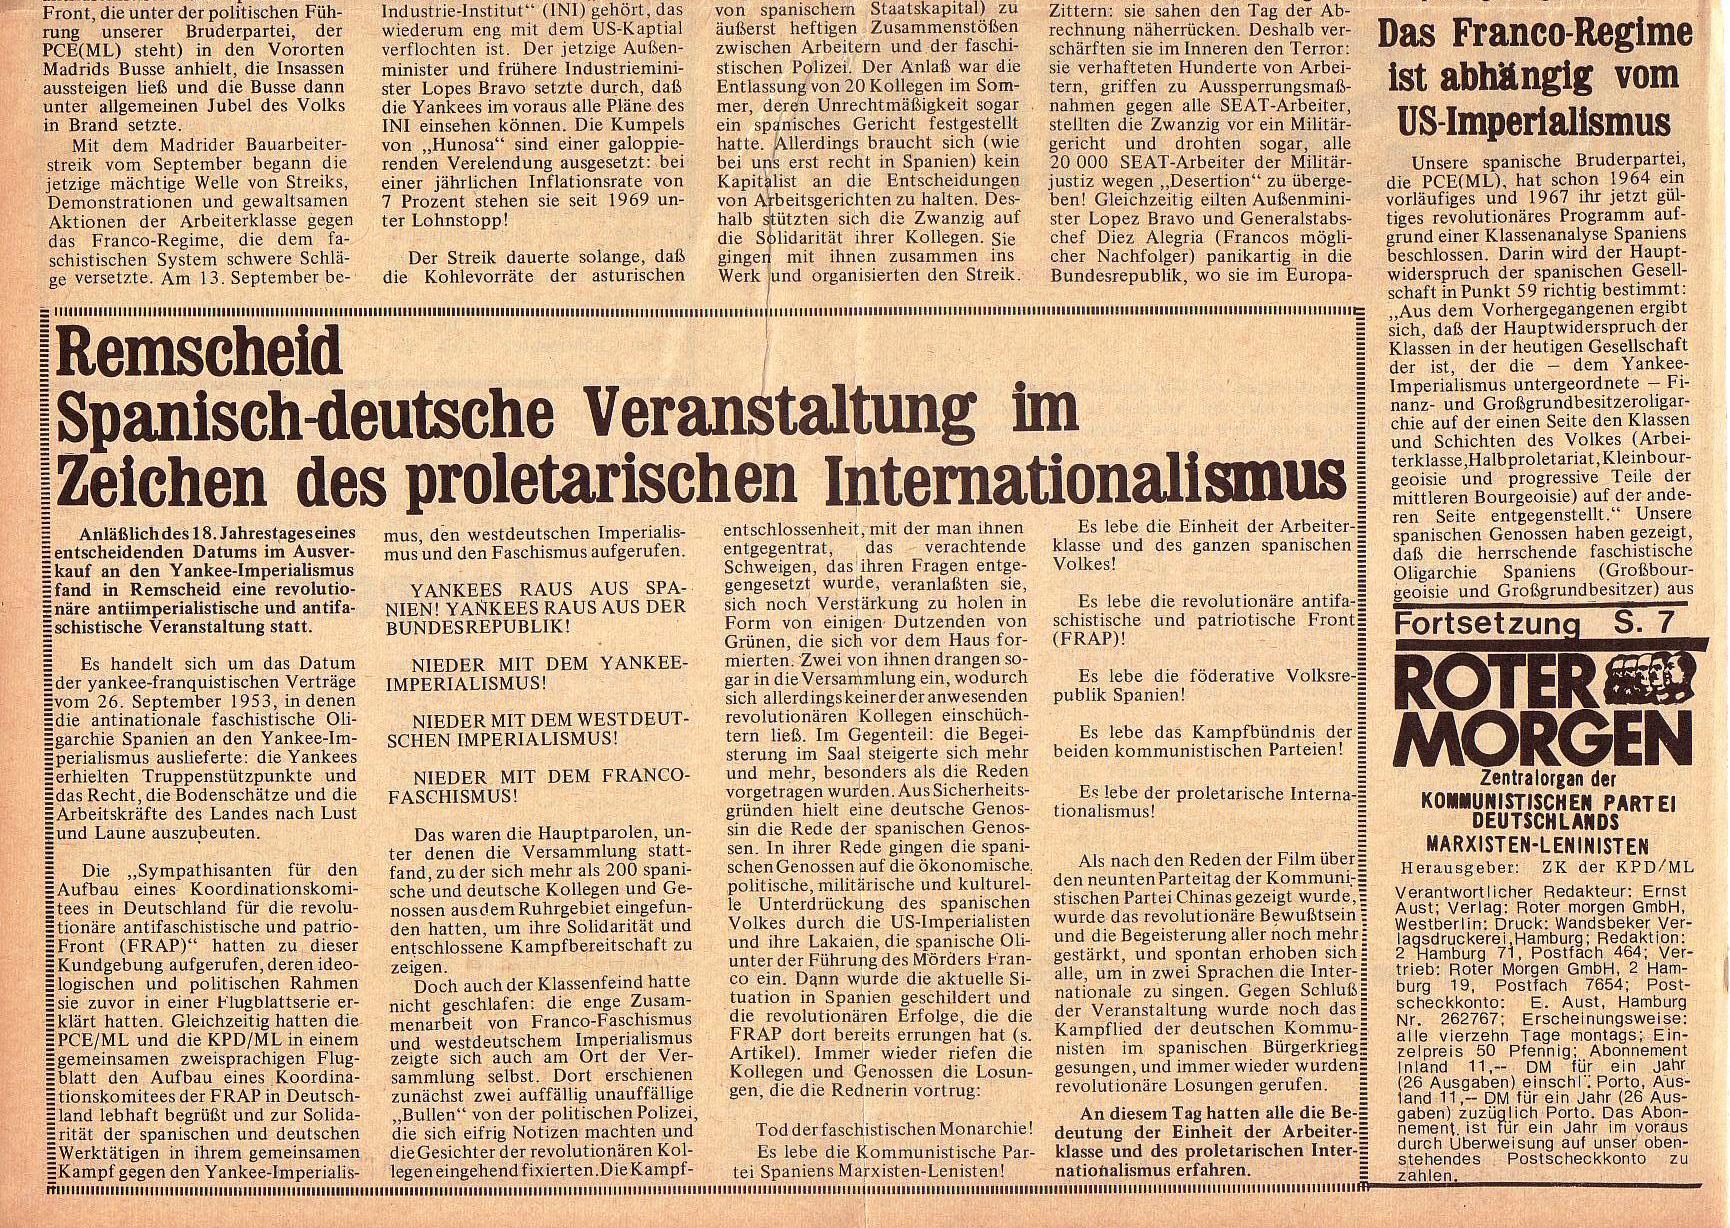 Roter Morgen, 5. Jg., 6. Dezember 1971, Nr. 15, Seite 2b